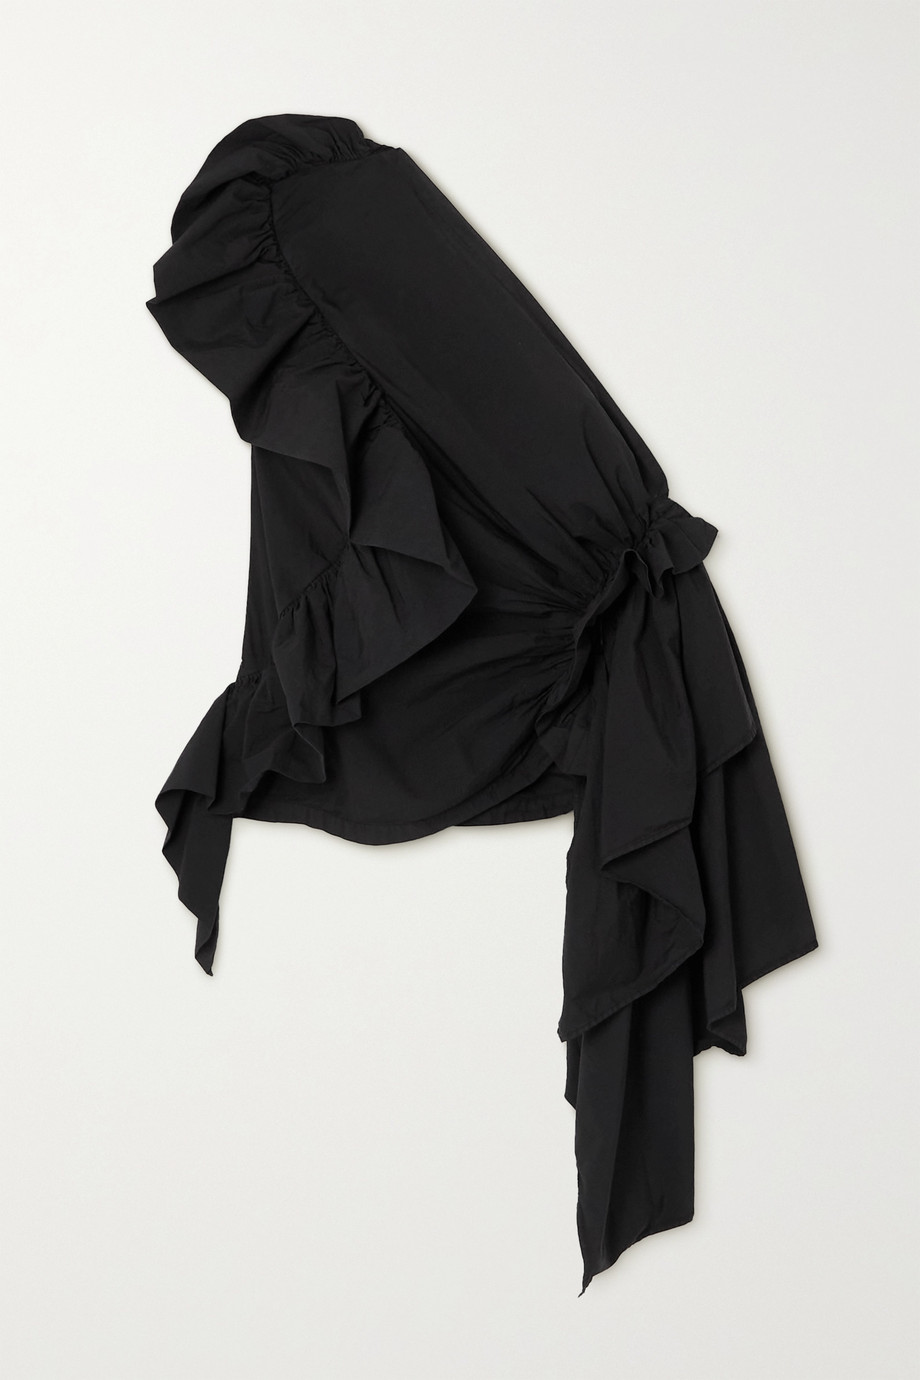 Dries Van Noten One-shoulder draped ruffled cotton-blend sateen top